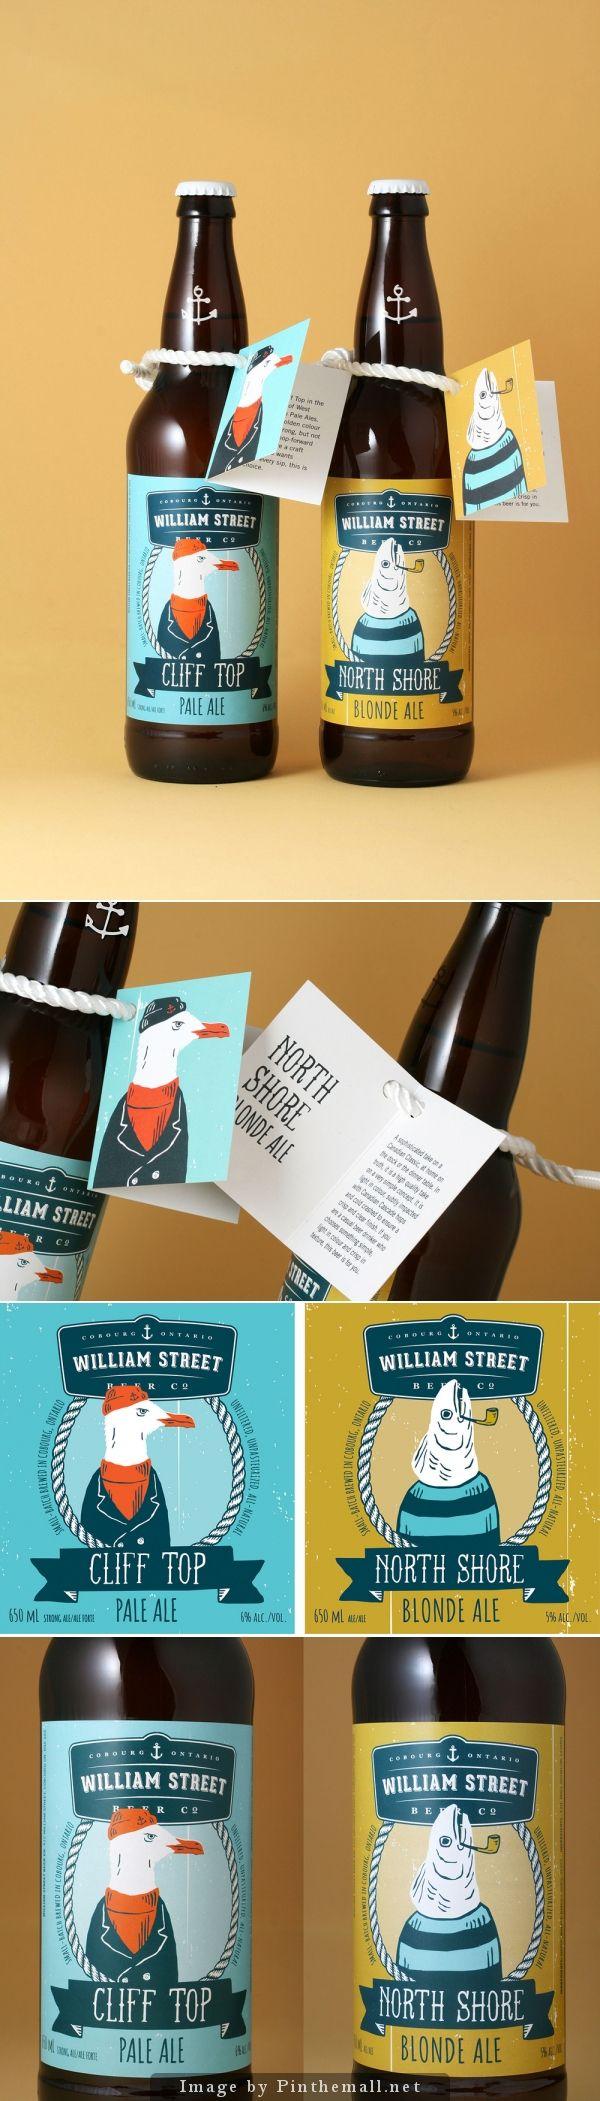 William Street Beer Co. #label #design   by Luke Despatie  The Design Firm